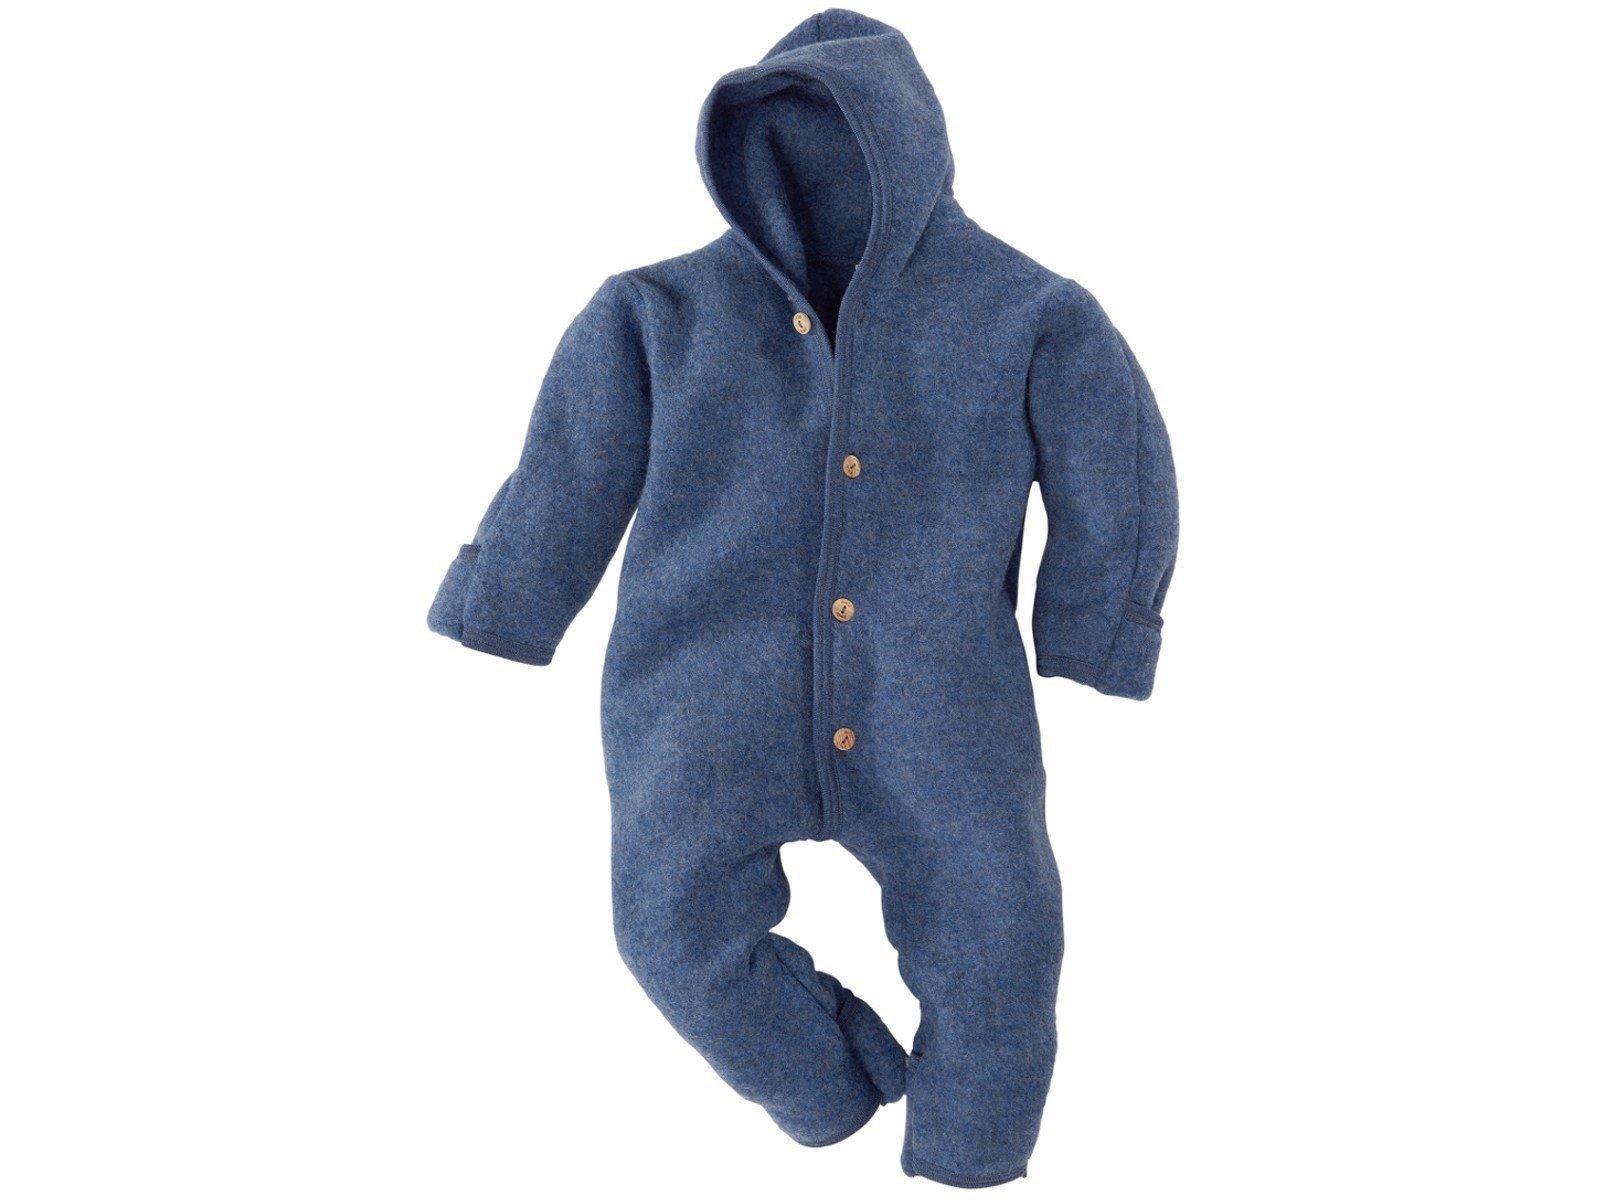 Engel 100% Organic Fleece Merino Wool Overall Romper Made in Germany (86/92 (12-24 Months), Blue Melange)